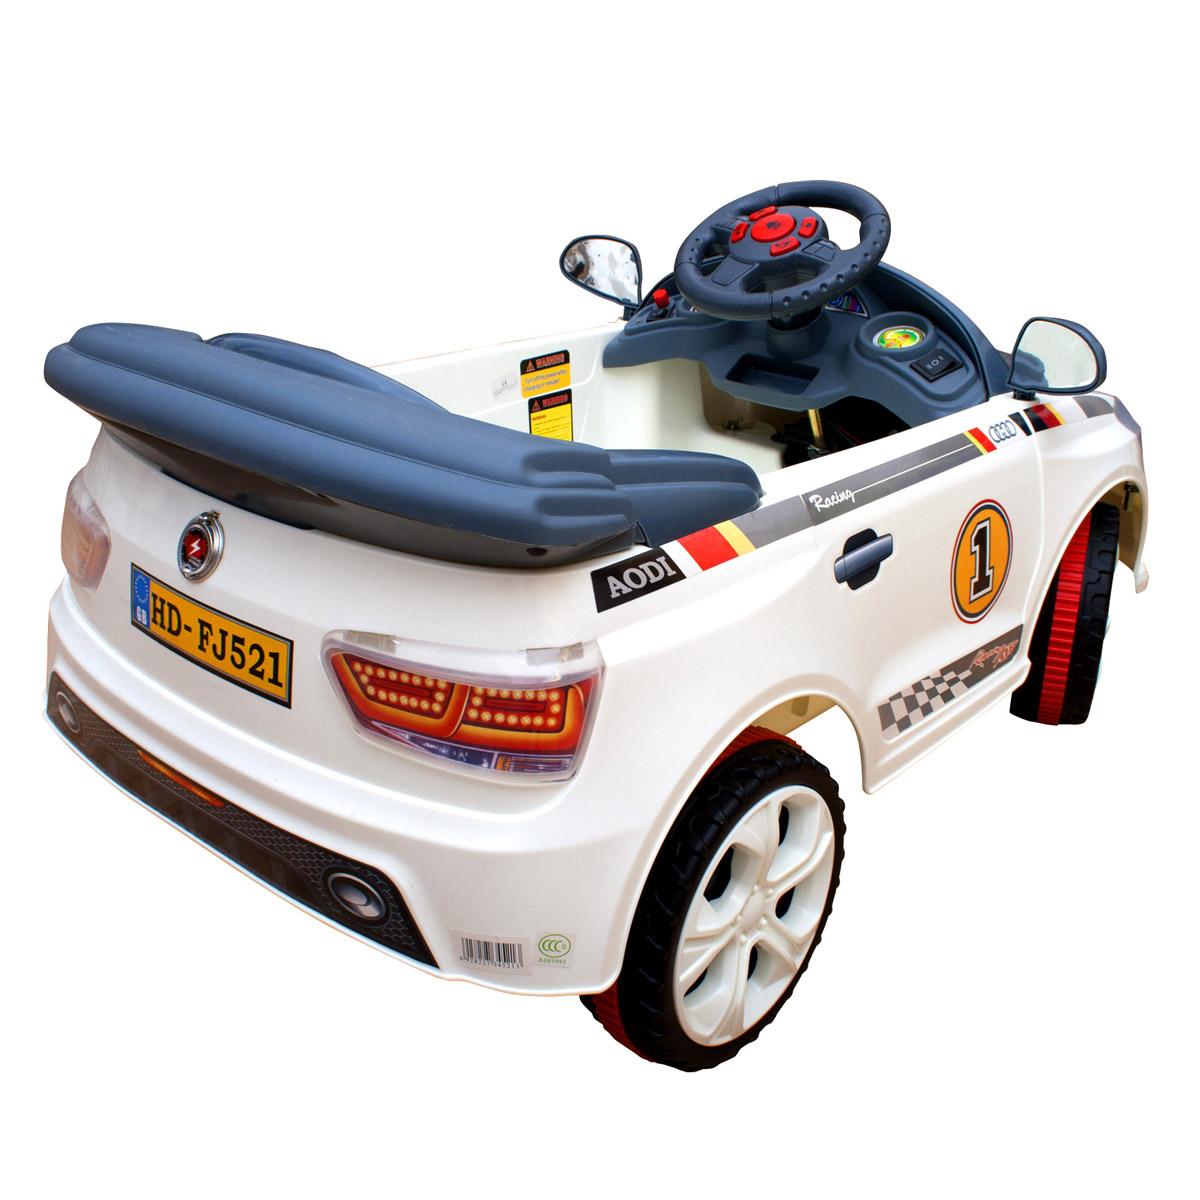 elektrisches kinderfahrzeug kinderauto kindercar cabrio. Black Bedroom Furniture Sets. Home Design Ideas